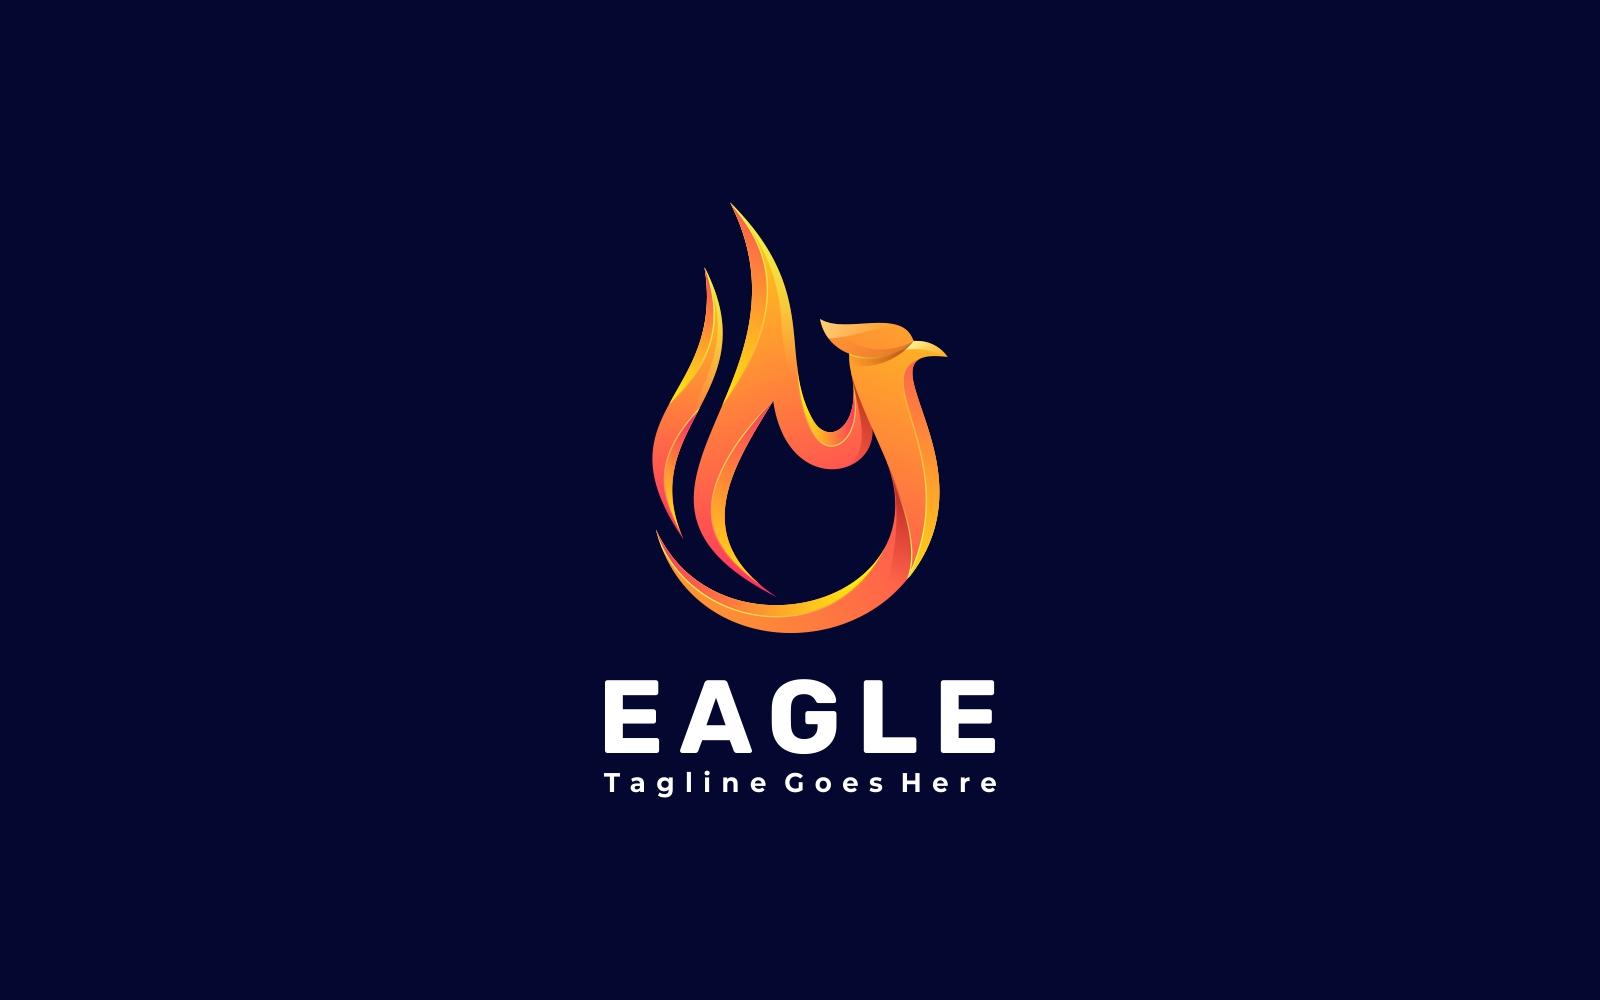 Fire Eagle Gradient Logo Template